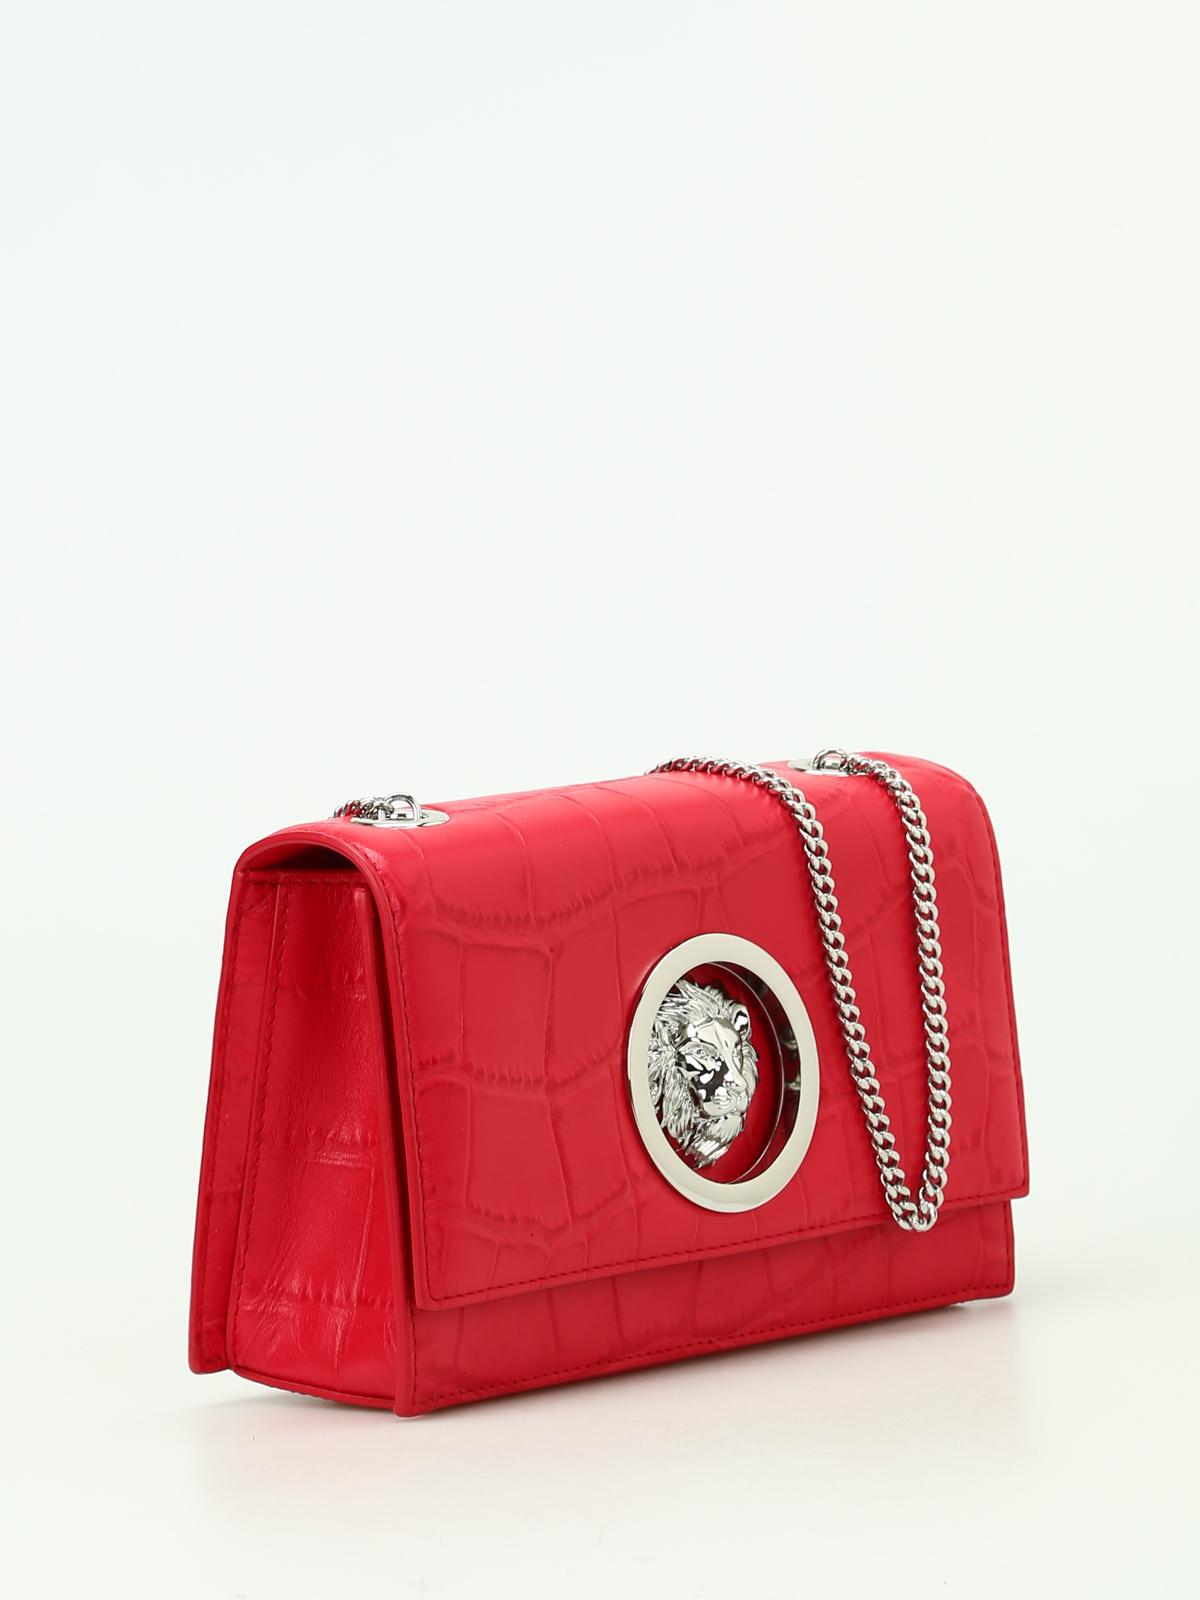 3f2510e1 Versus Versace - Lion Head red croco leather bag - cross body bags ...